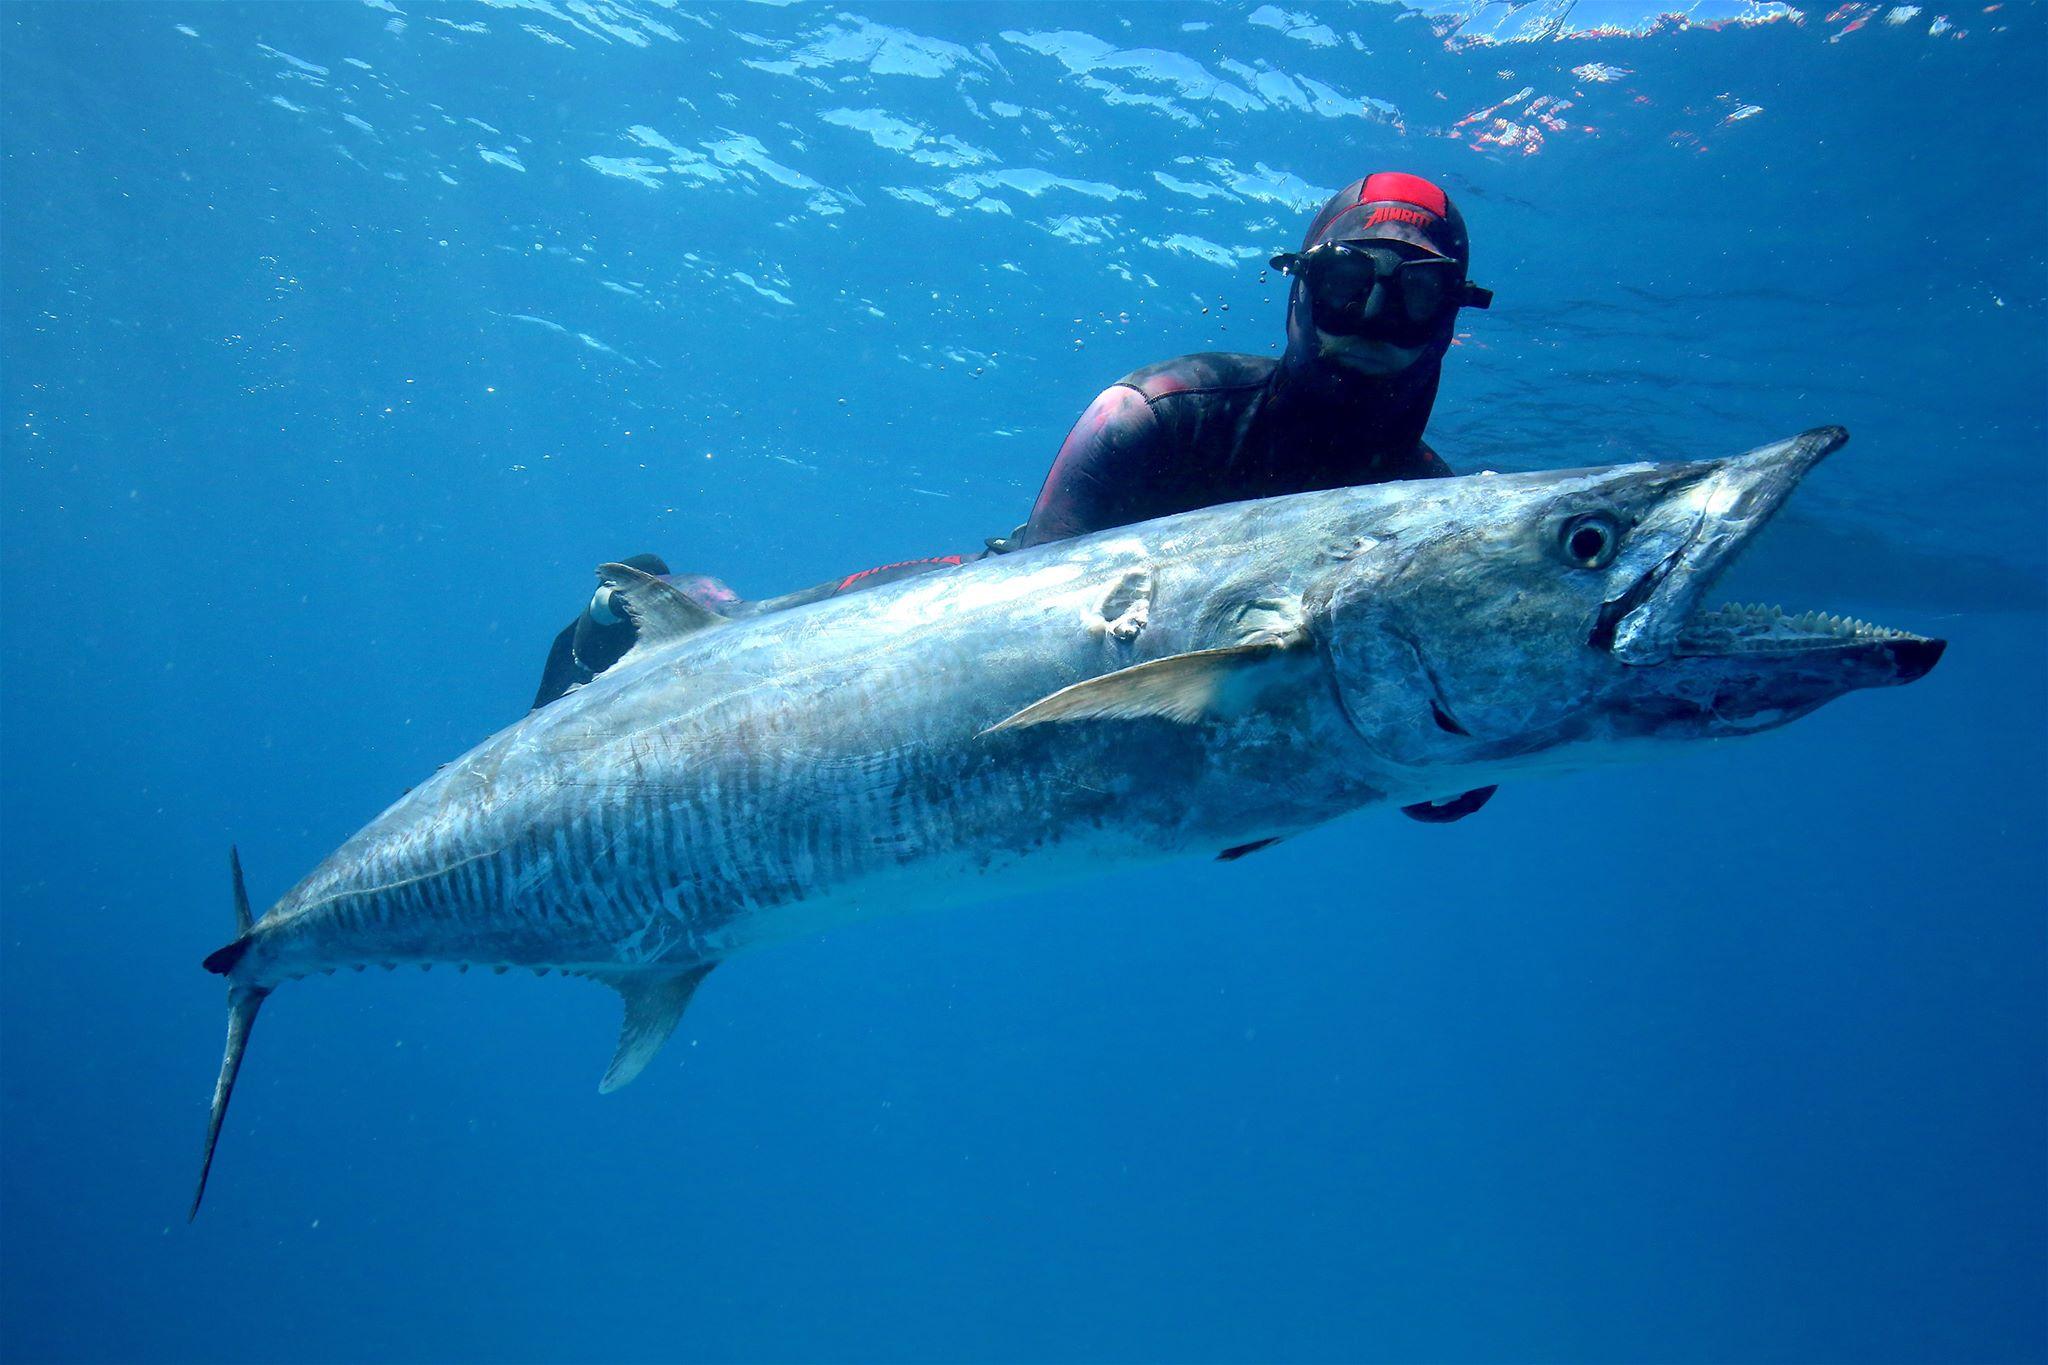 A 30kg Spanish Mackerel landed using the new Envy Reel.